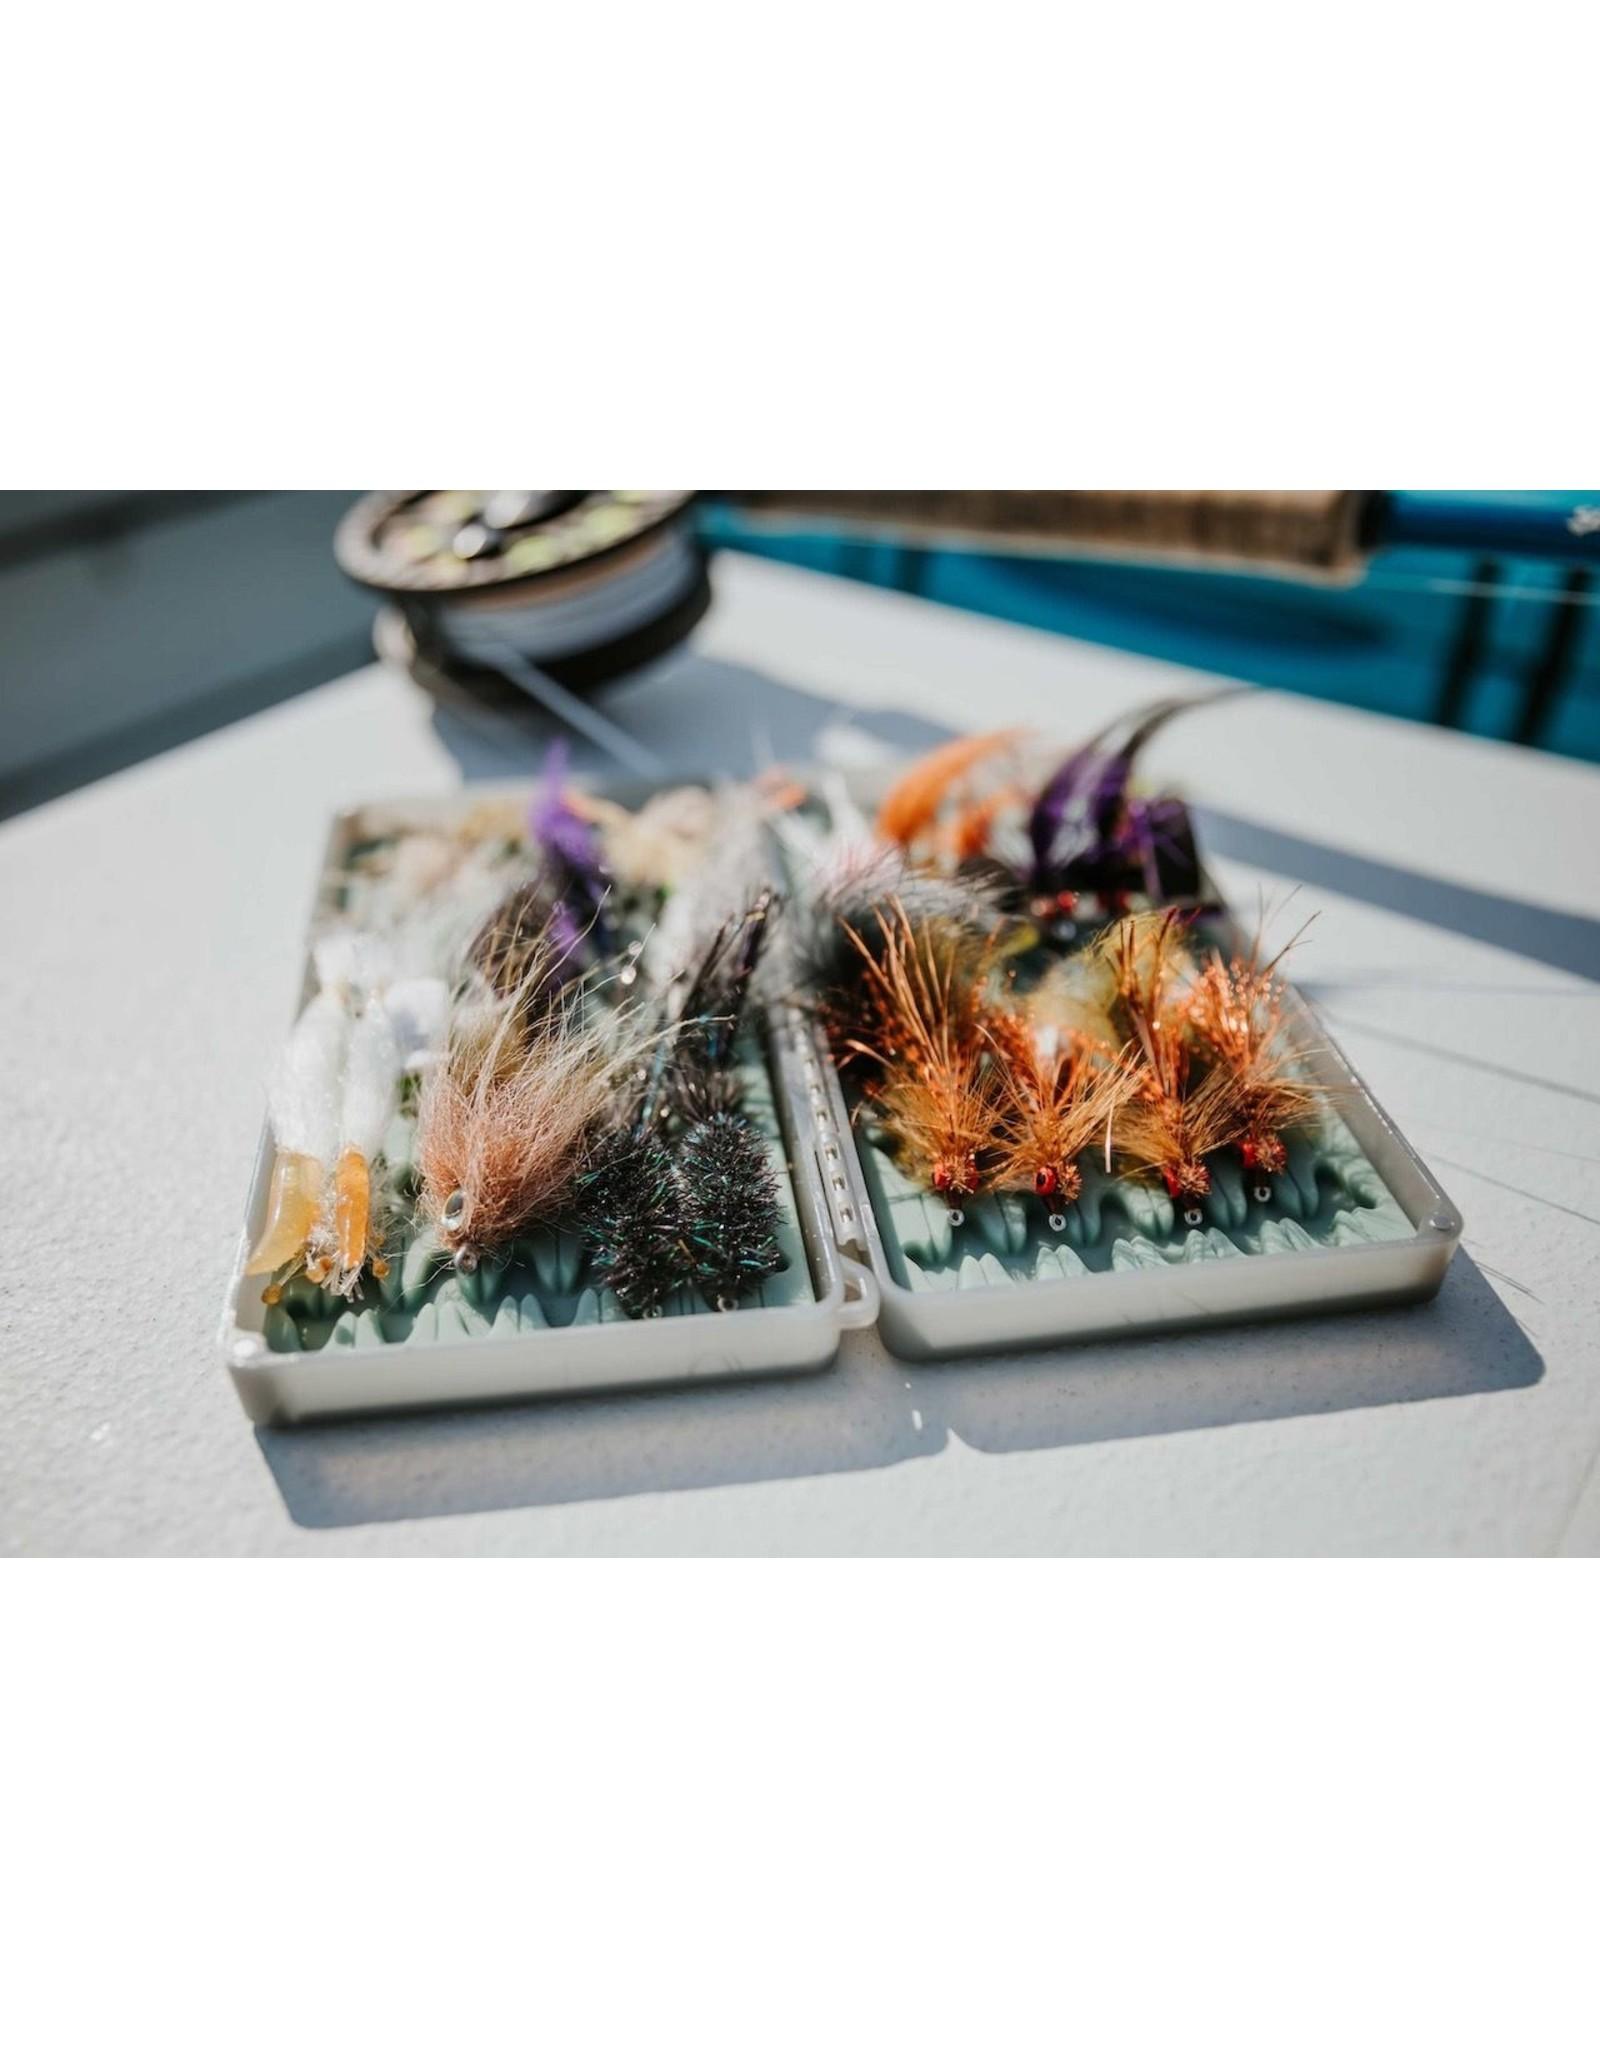 Fishpond Fishpond - Tacky Big Bug Fly Box